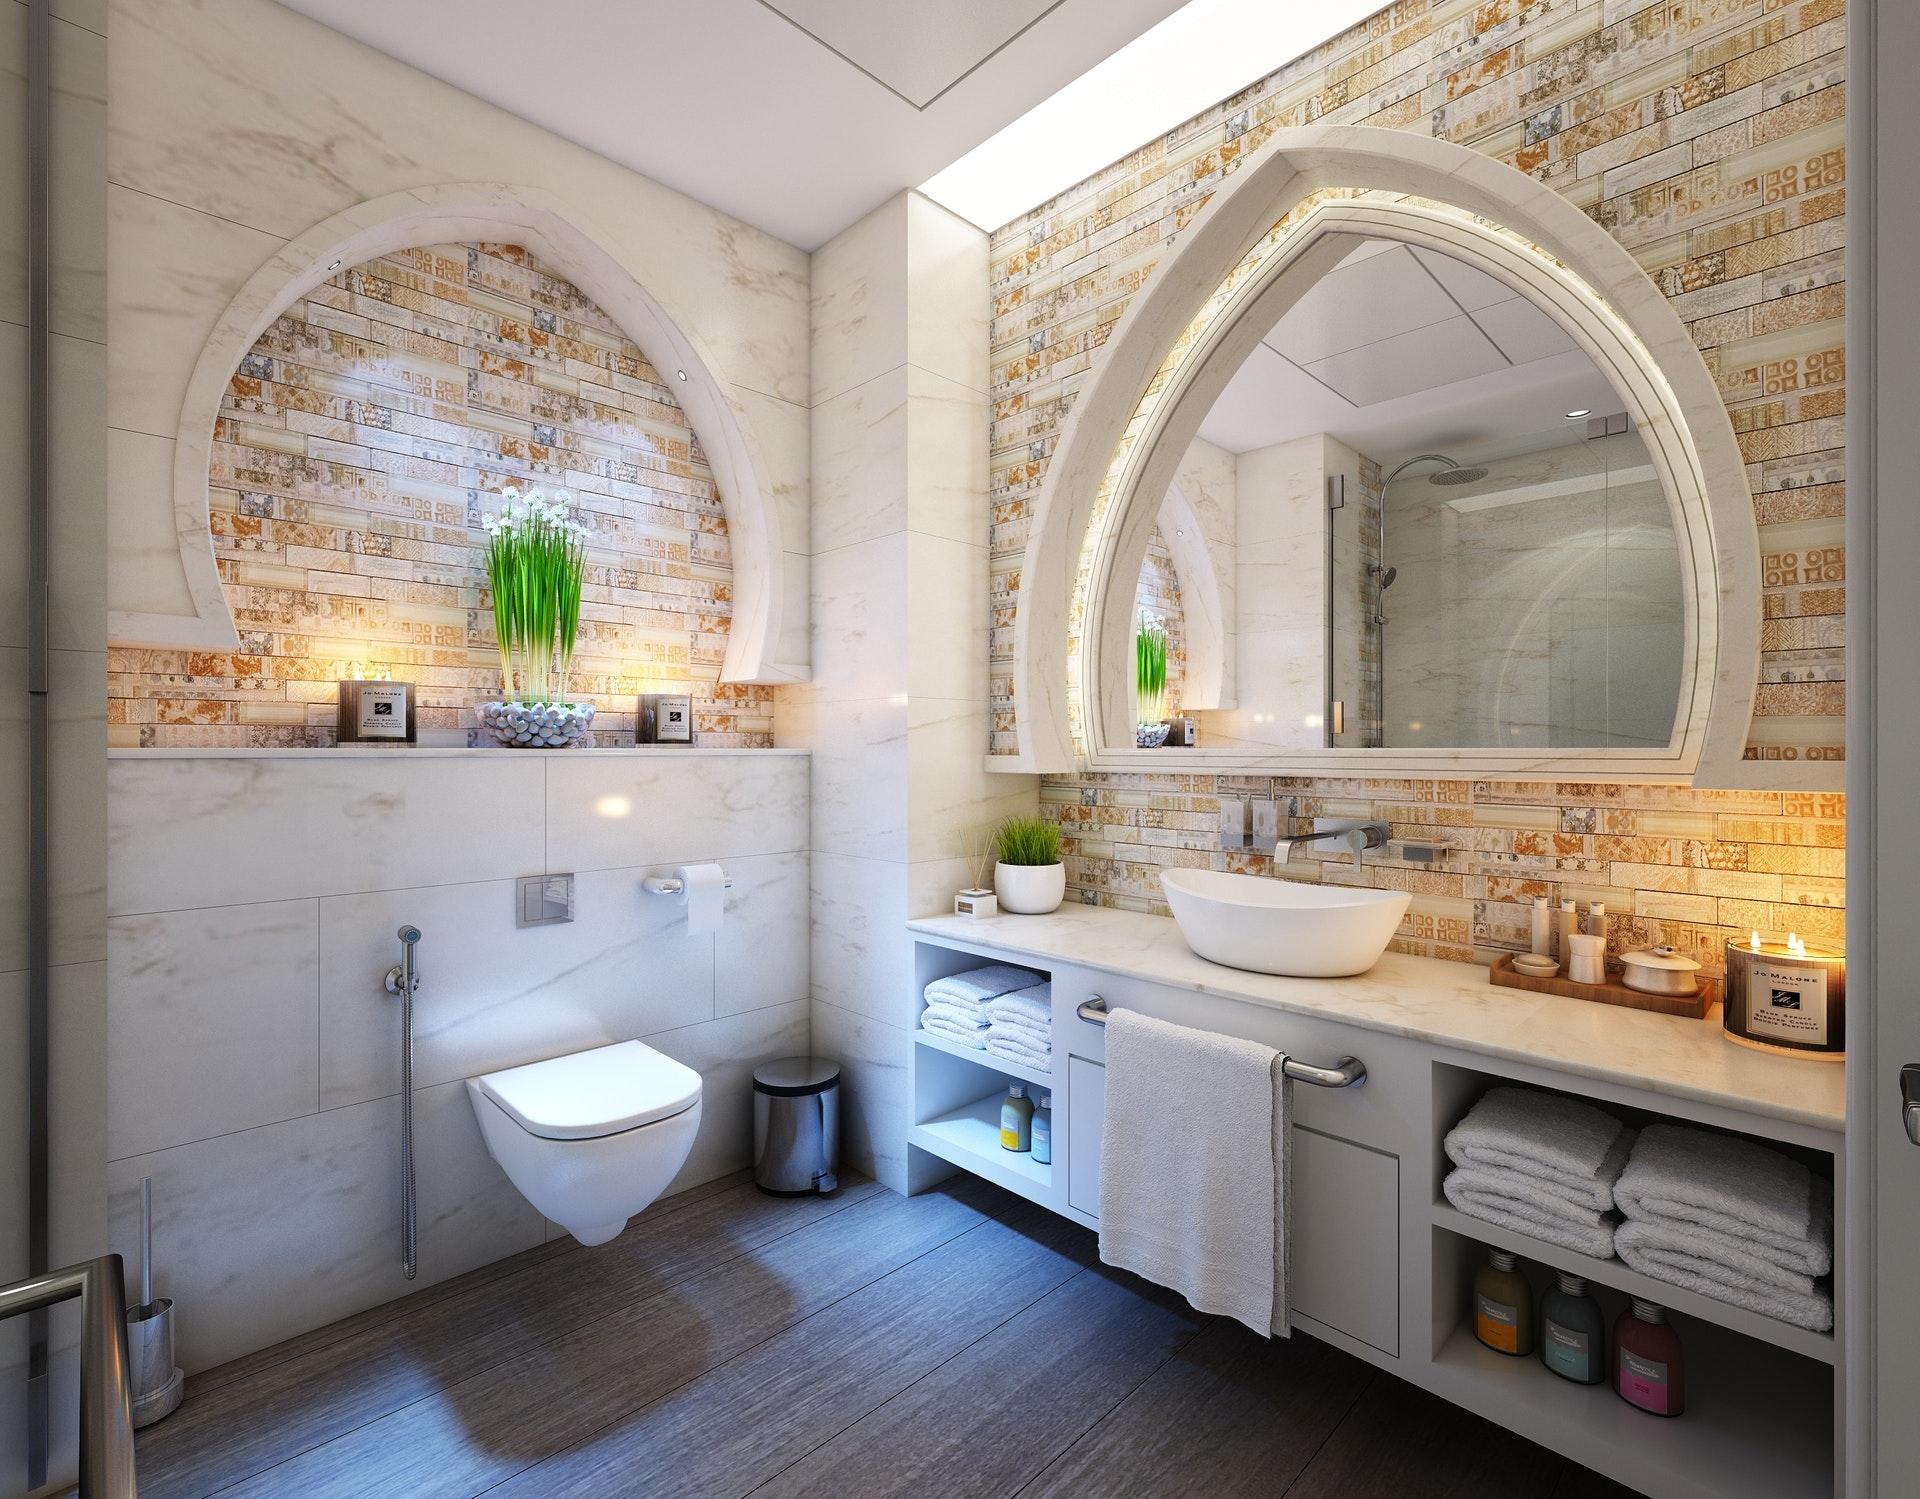 6 Design Ideas for Renovating a Master Bathroom